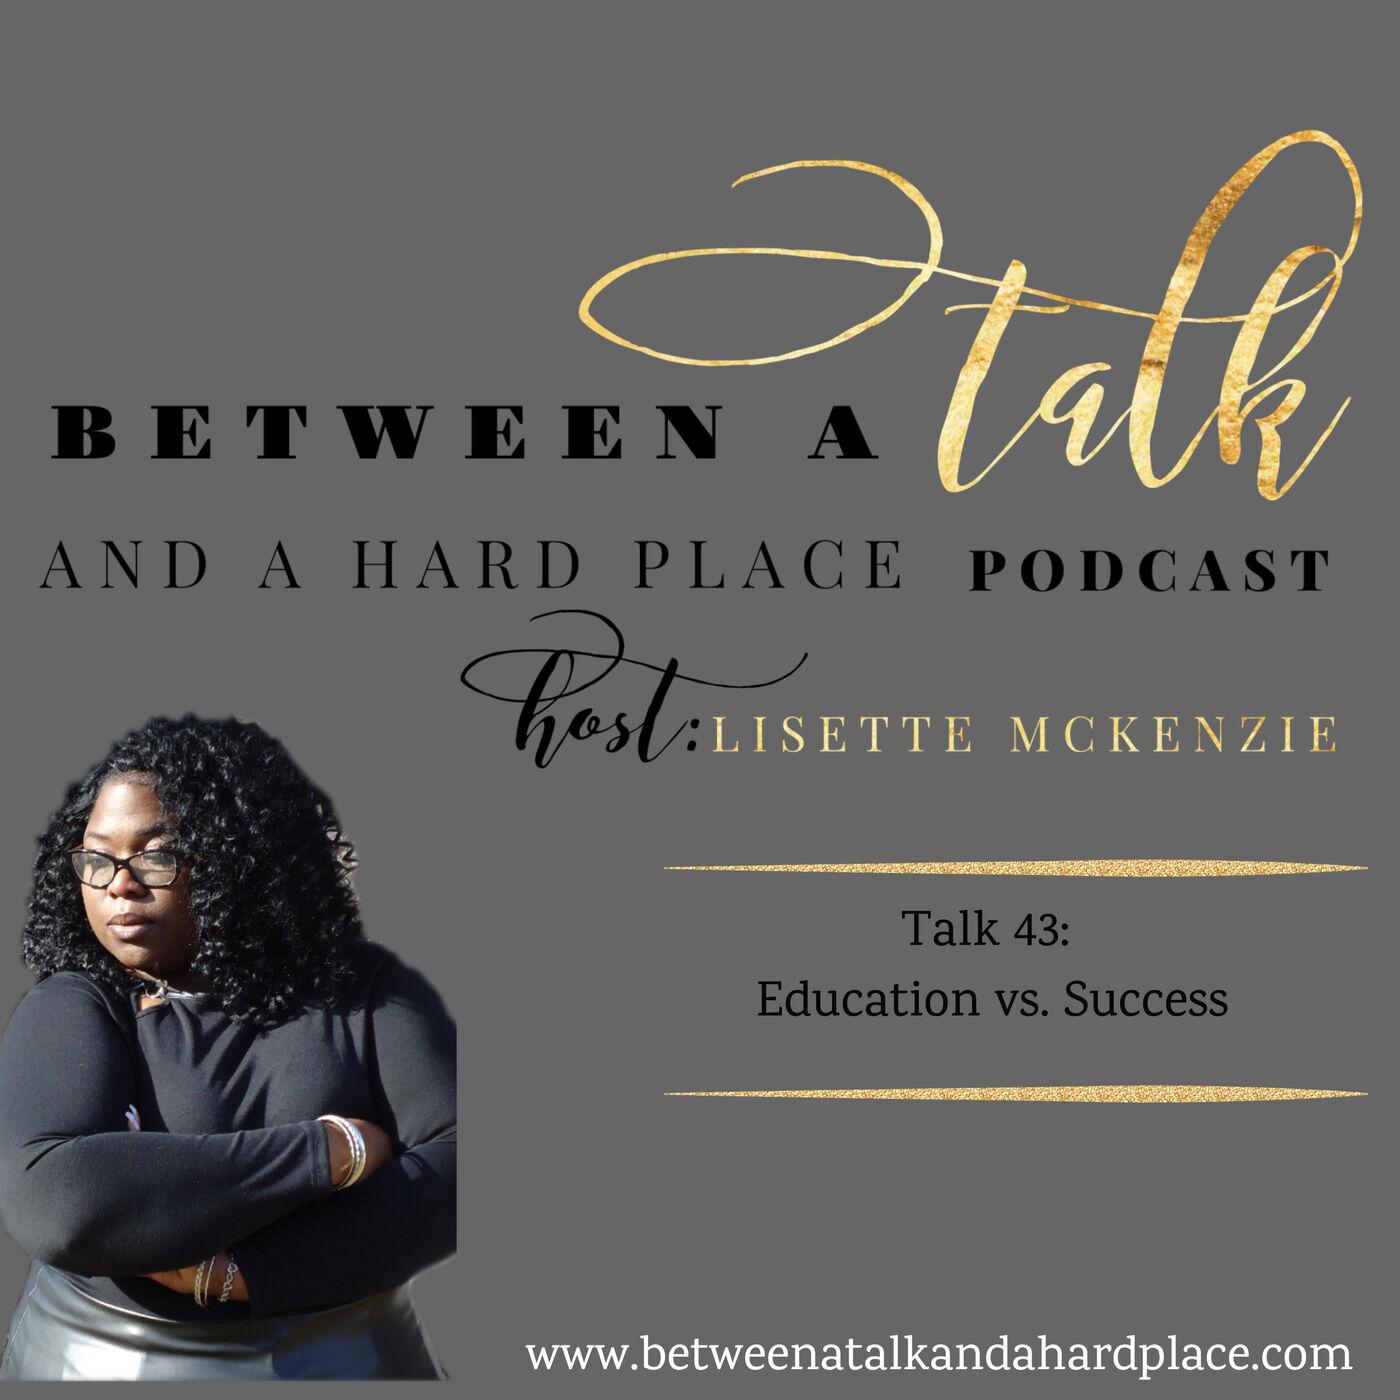 Talk 43: Education vs Success